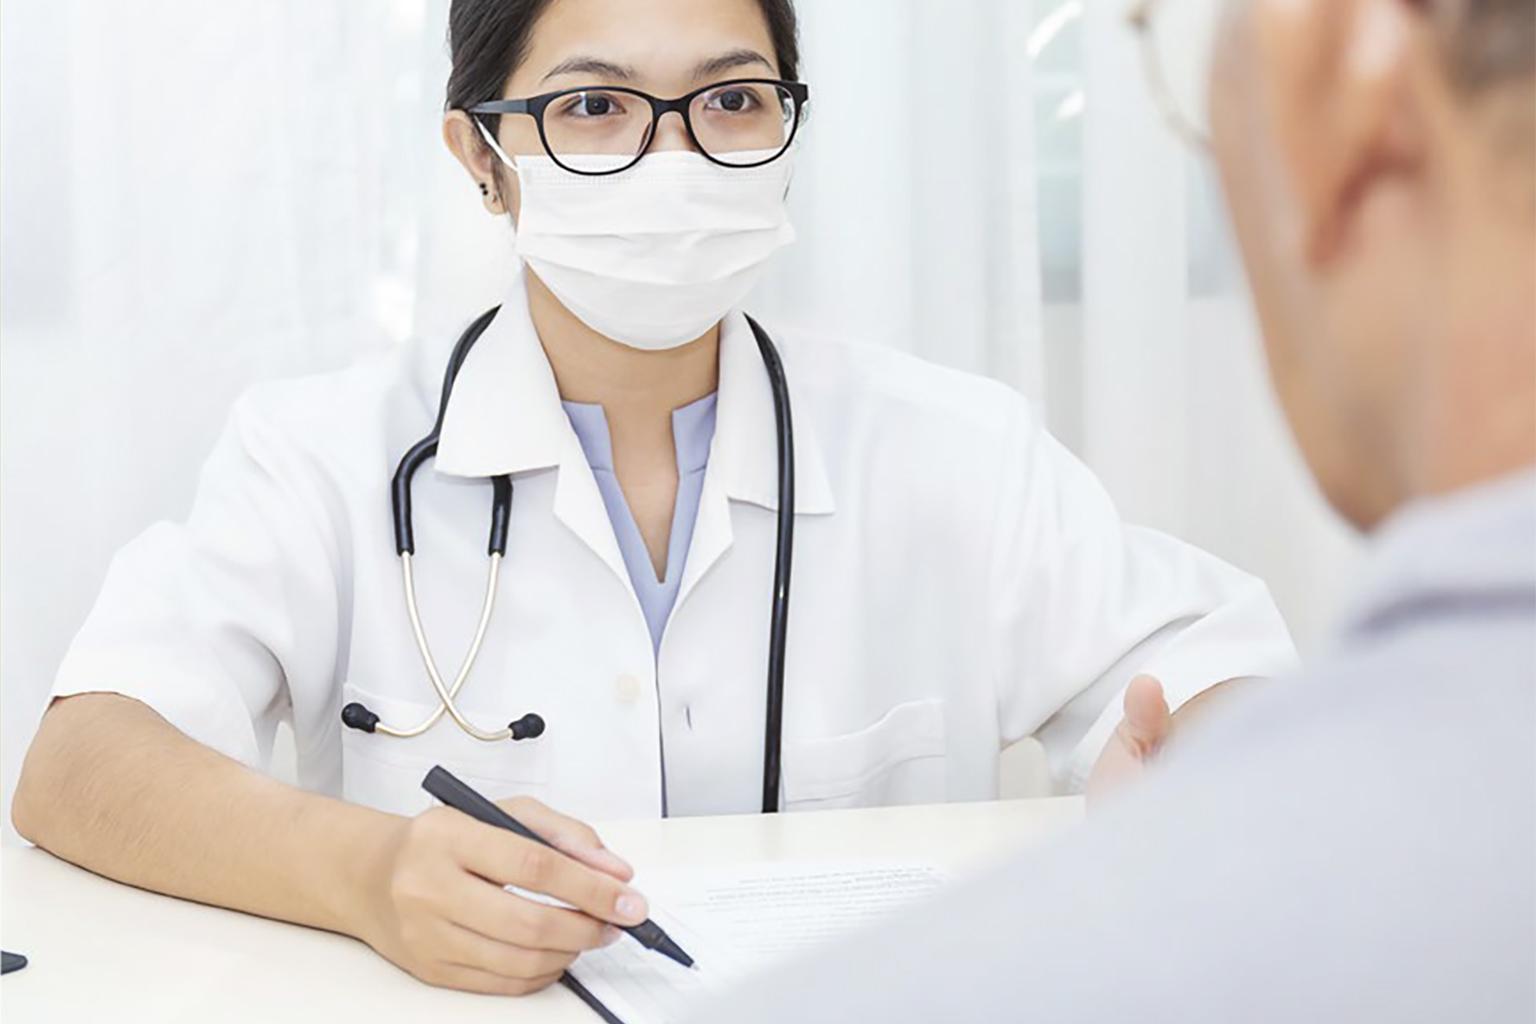 Inha University Hospital Improves